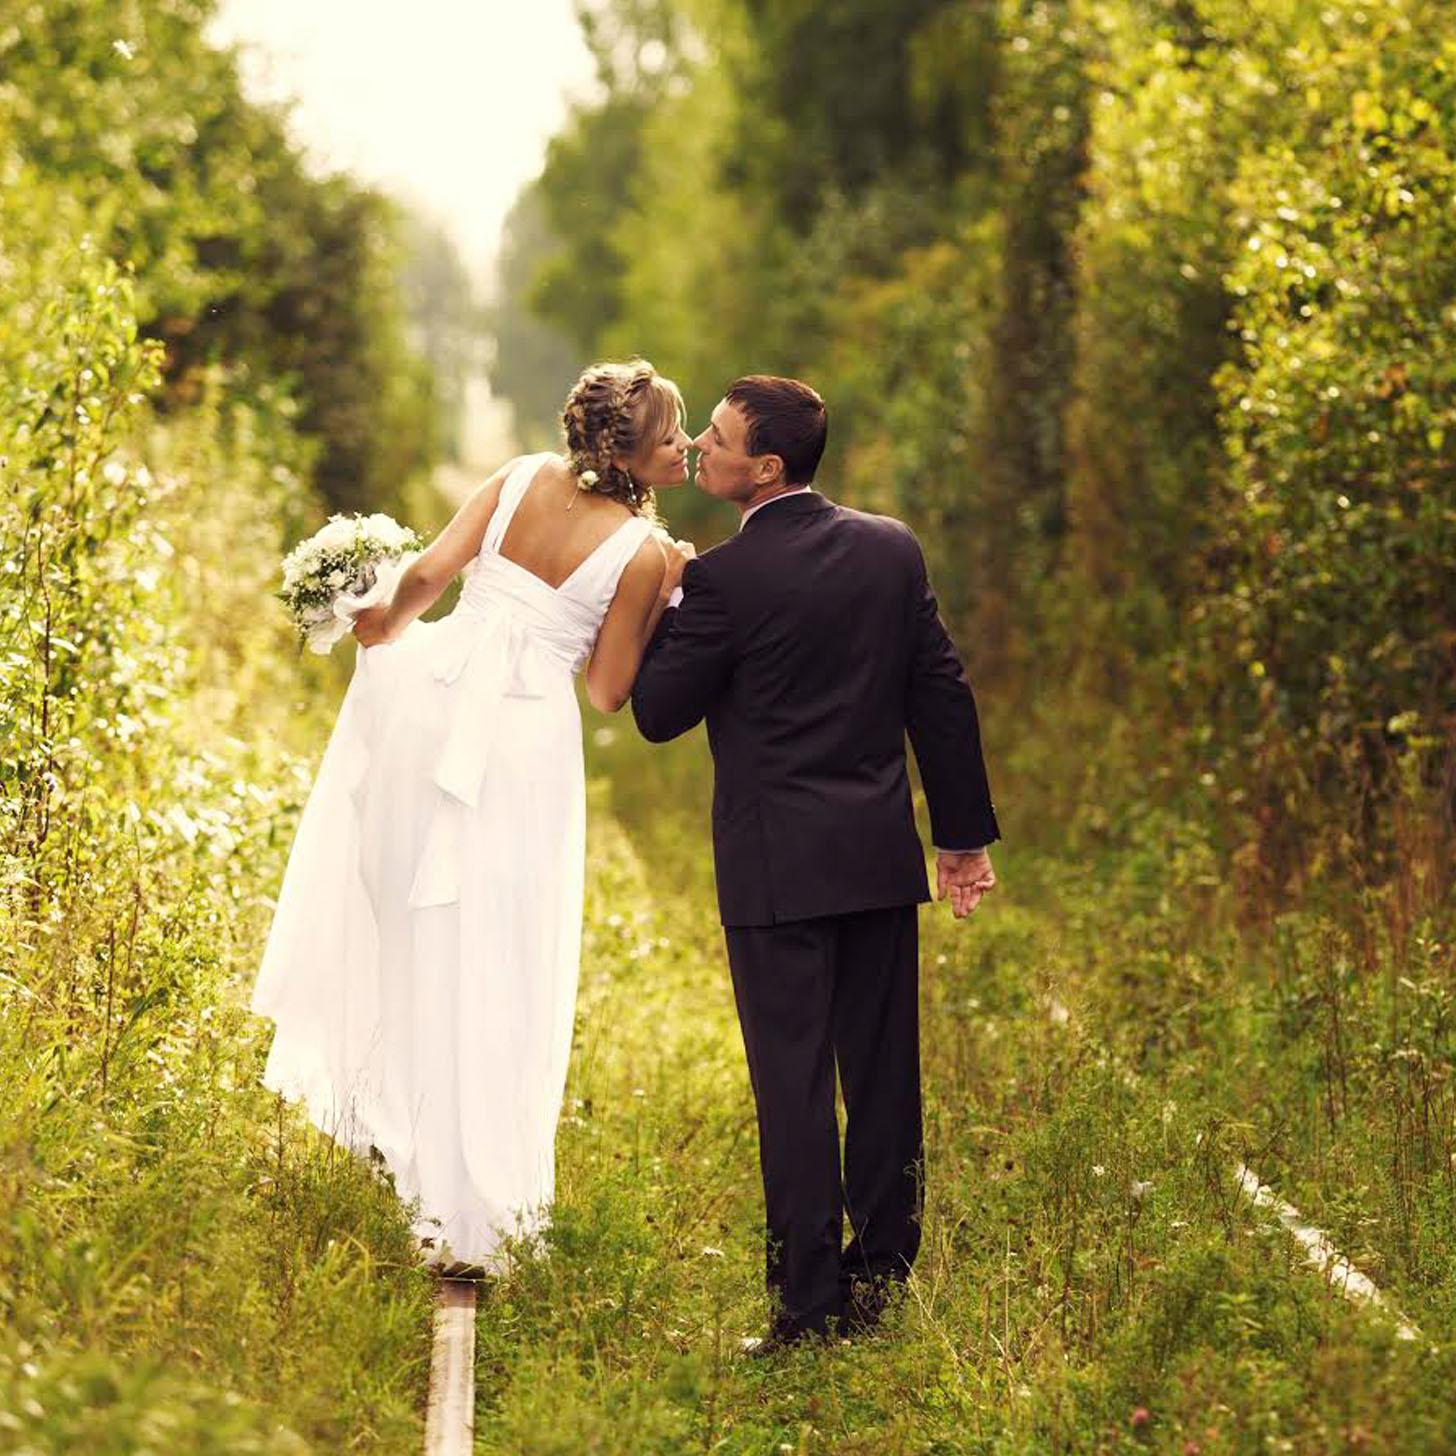 Best wedding dresses for an outdoor or garden wedding for Outdoor wedding pics